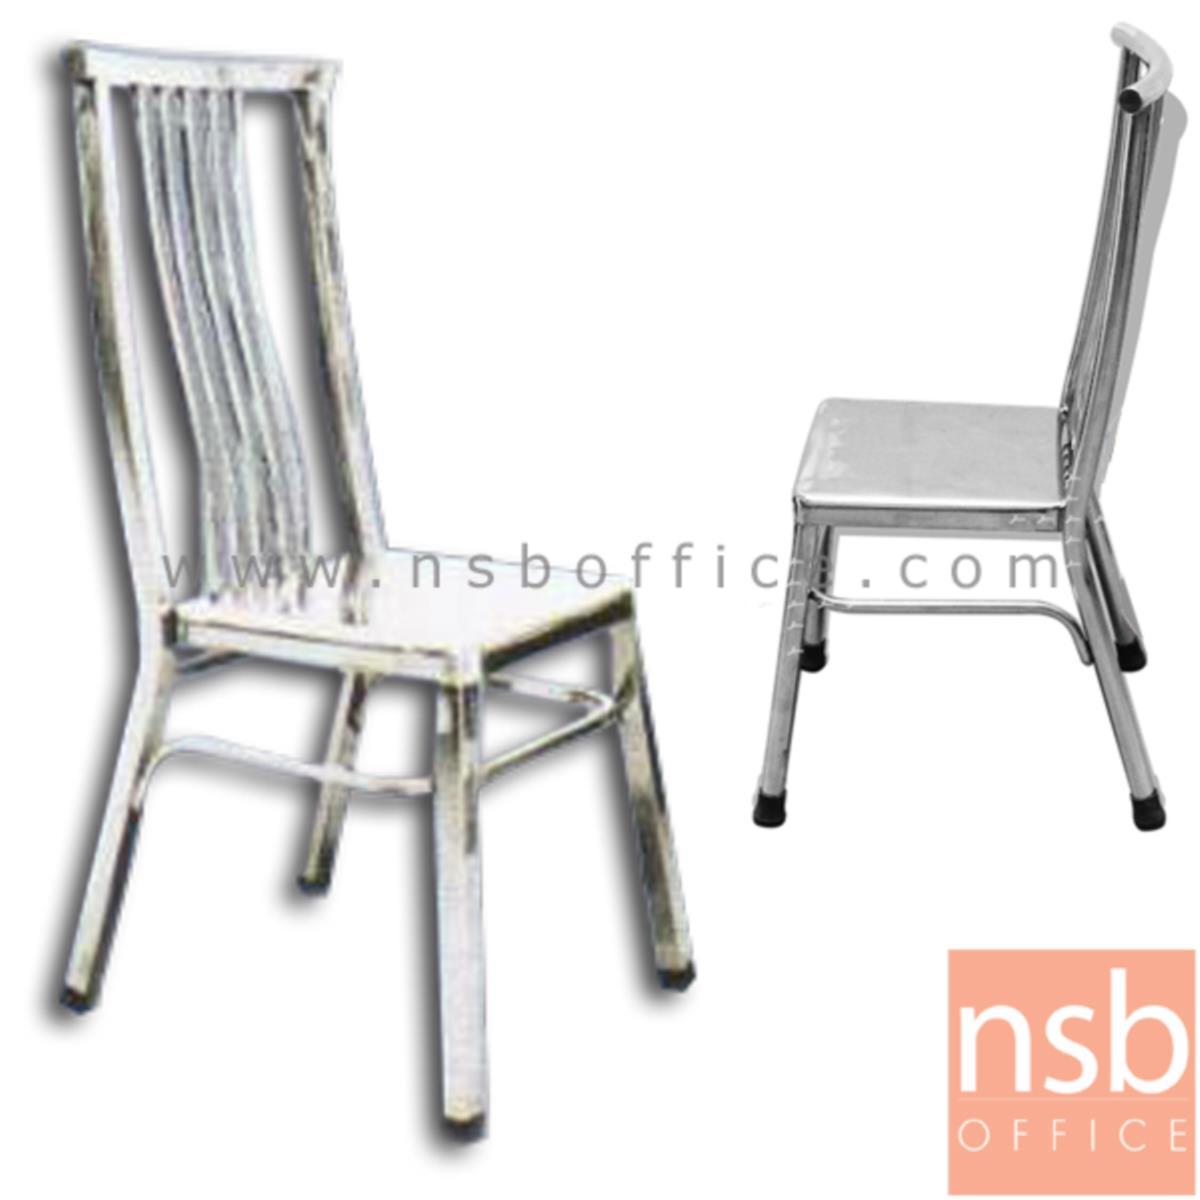 G12A193:เก้าอี้อเนกประสงค์สเตนเลส รุ่น Noctis (น็อคทิส) มีเส้นคาดขา (ผลิตจากสเตนเลสเหลี่ยม)